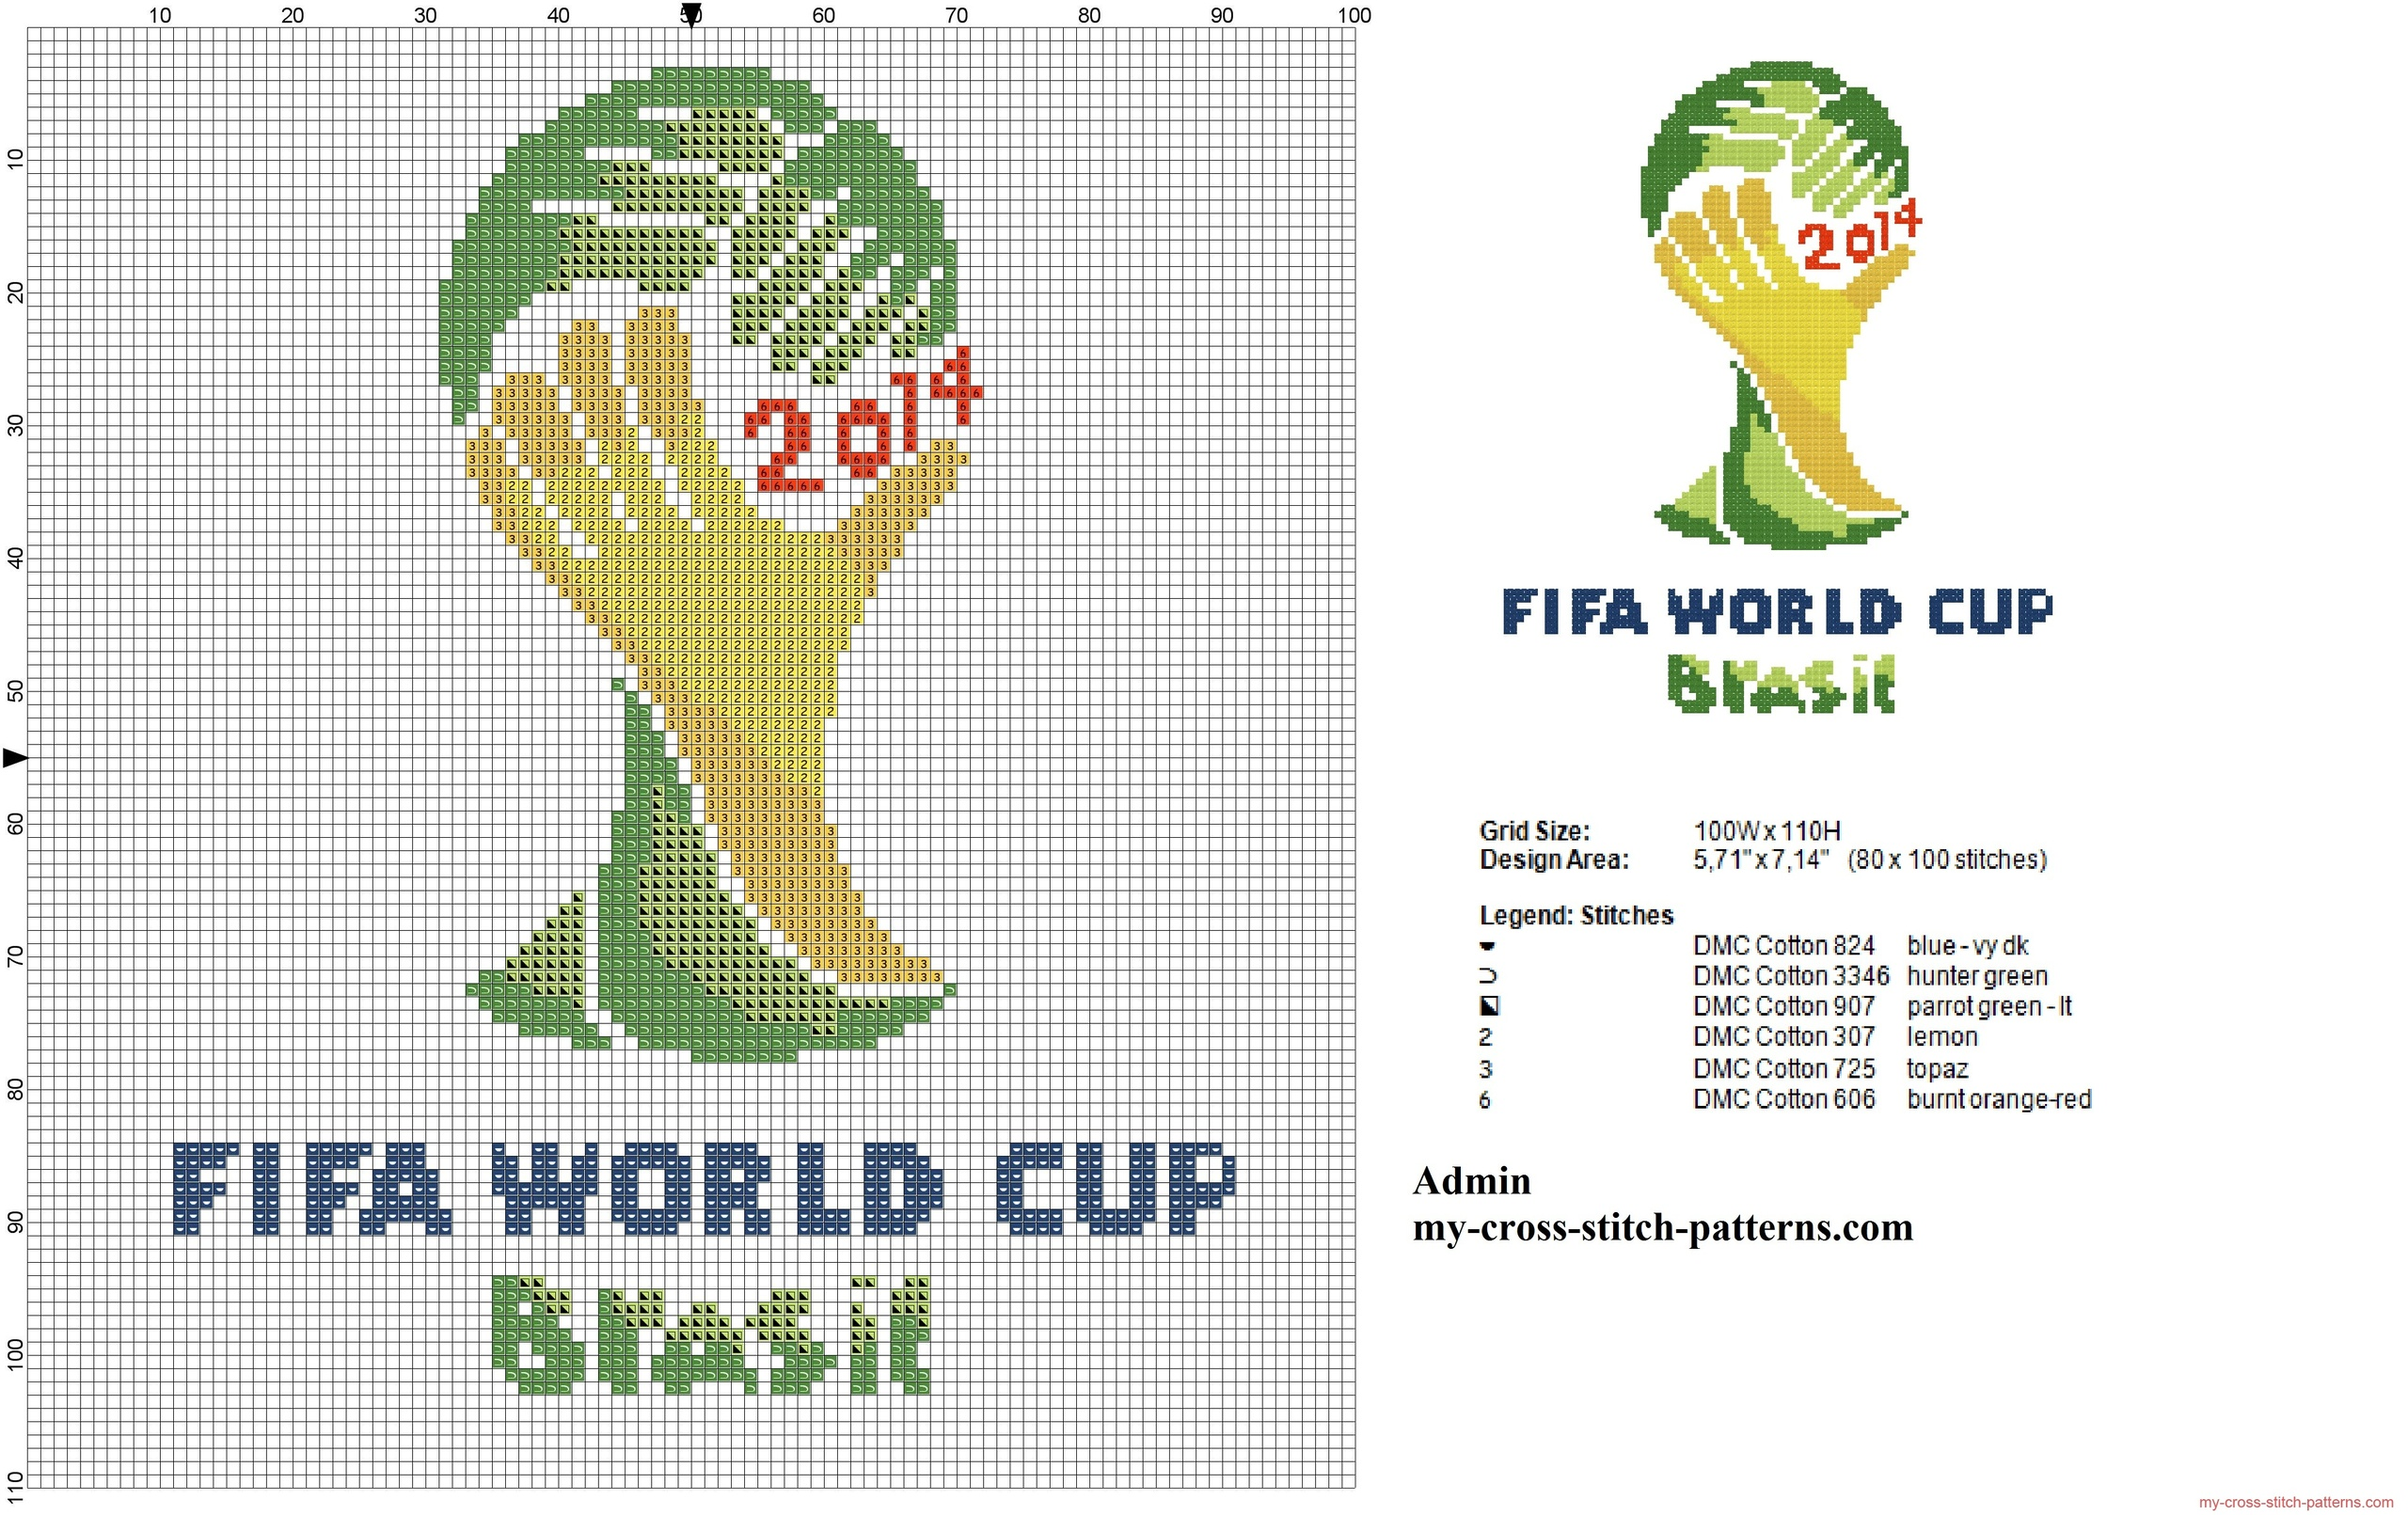 logo_fifa_world_cup_2014_cross_stitch_pattern